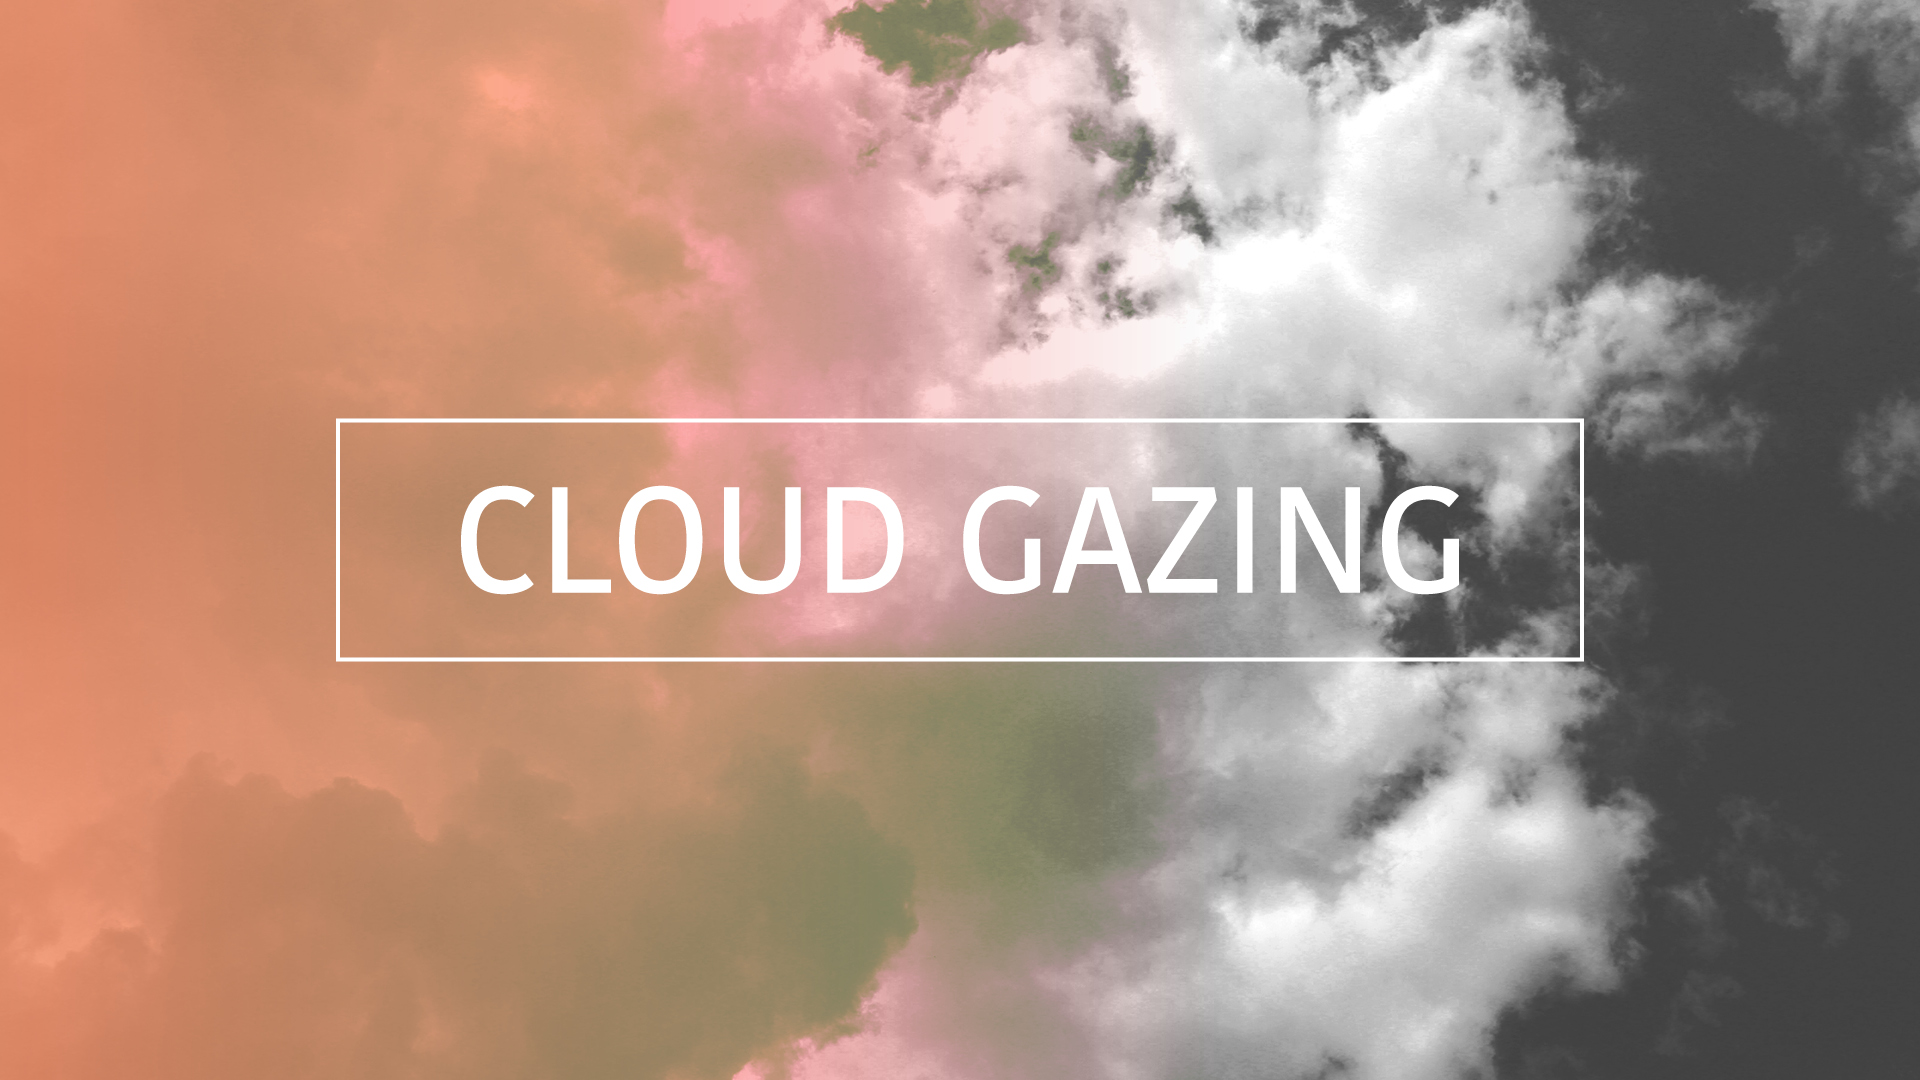 Cloud Gazing Message Title Slide  2.jpg